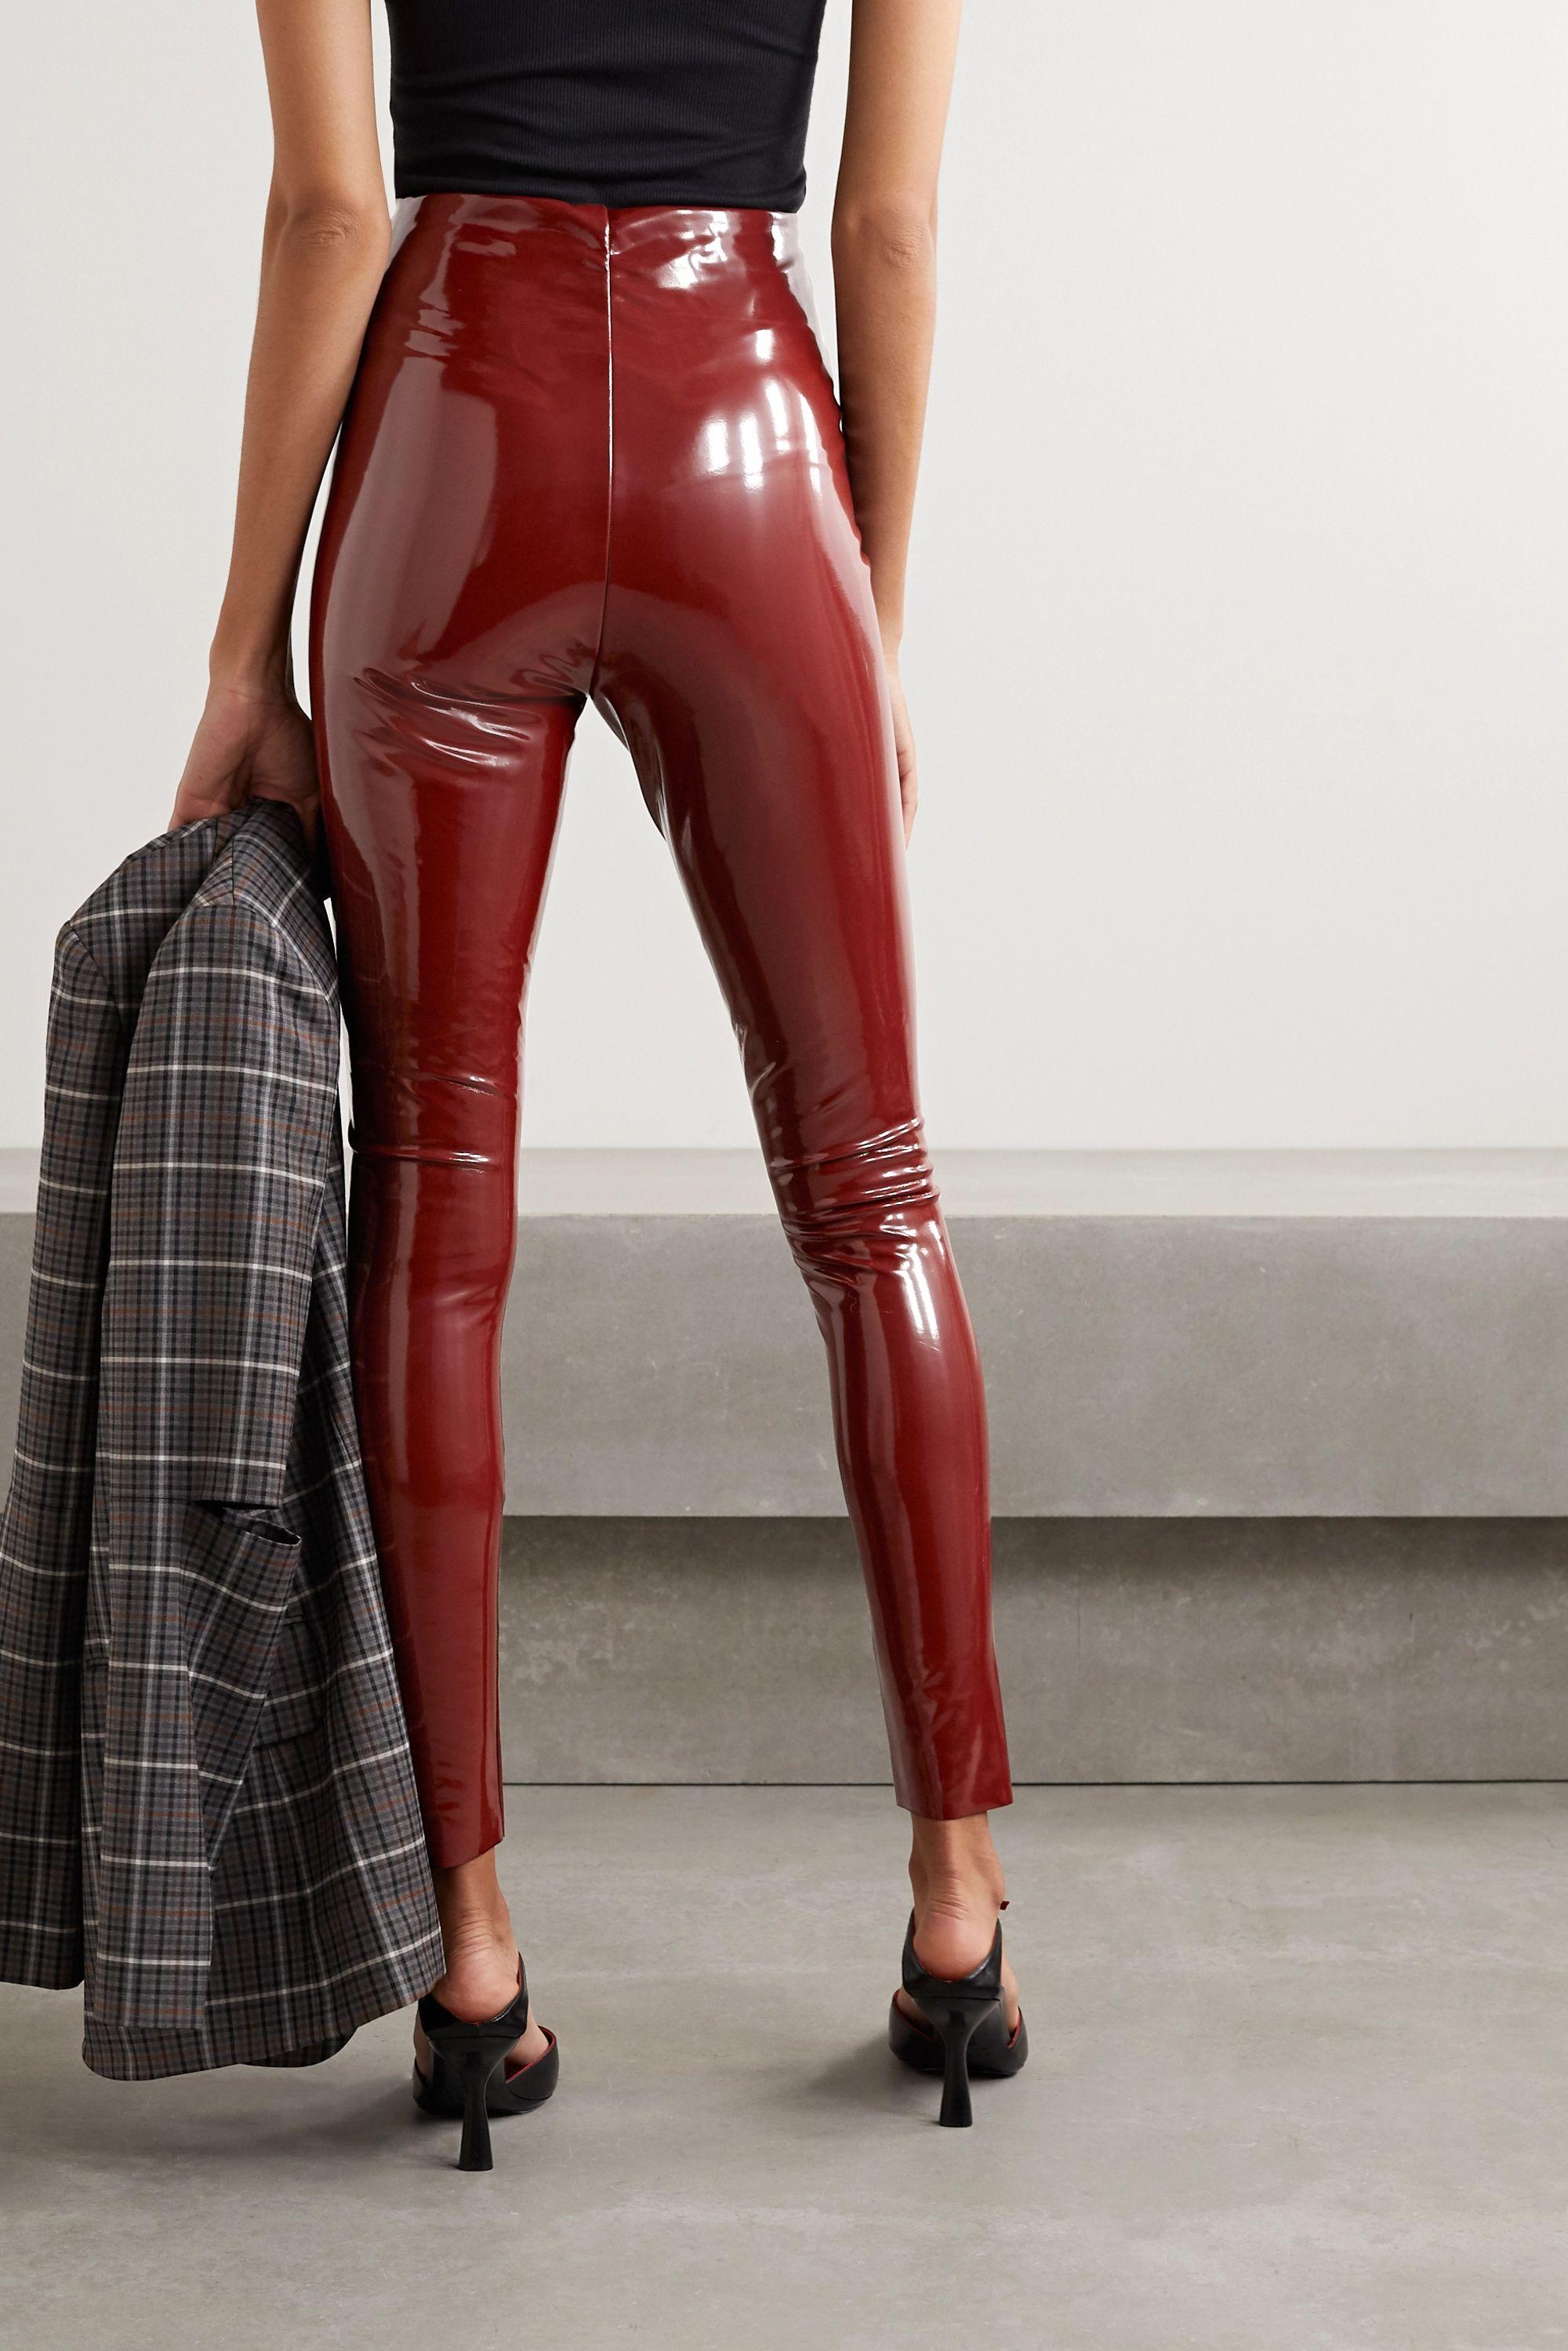 Commando Stretch faux patent-leather leggings